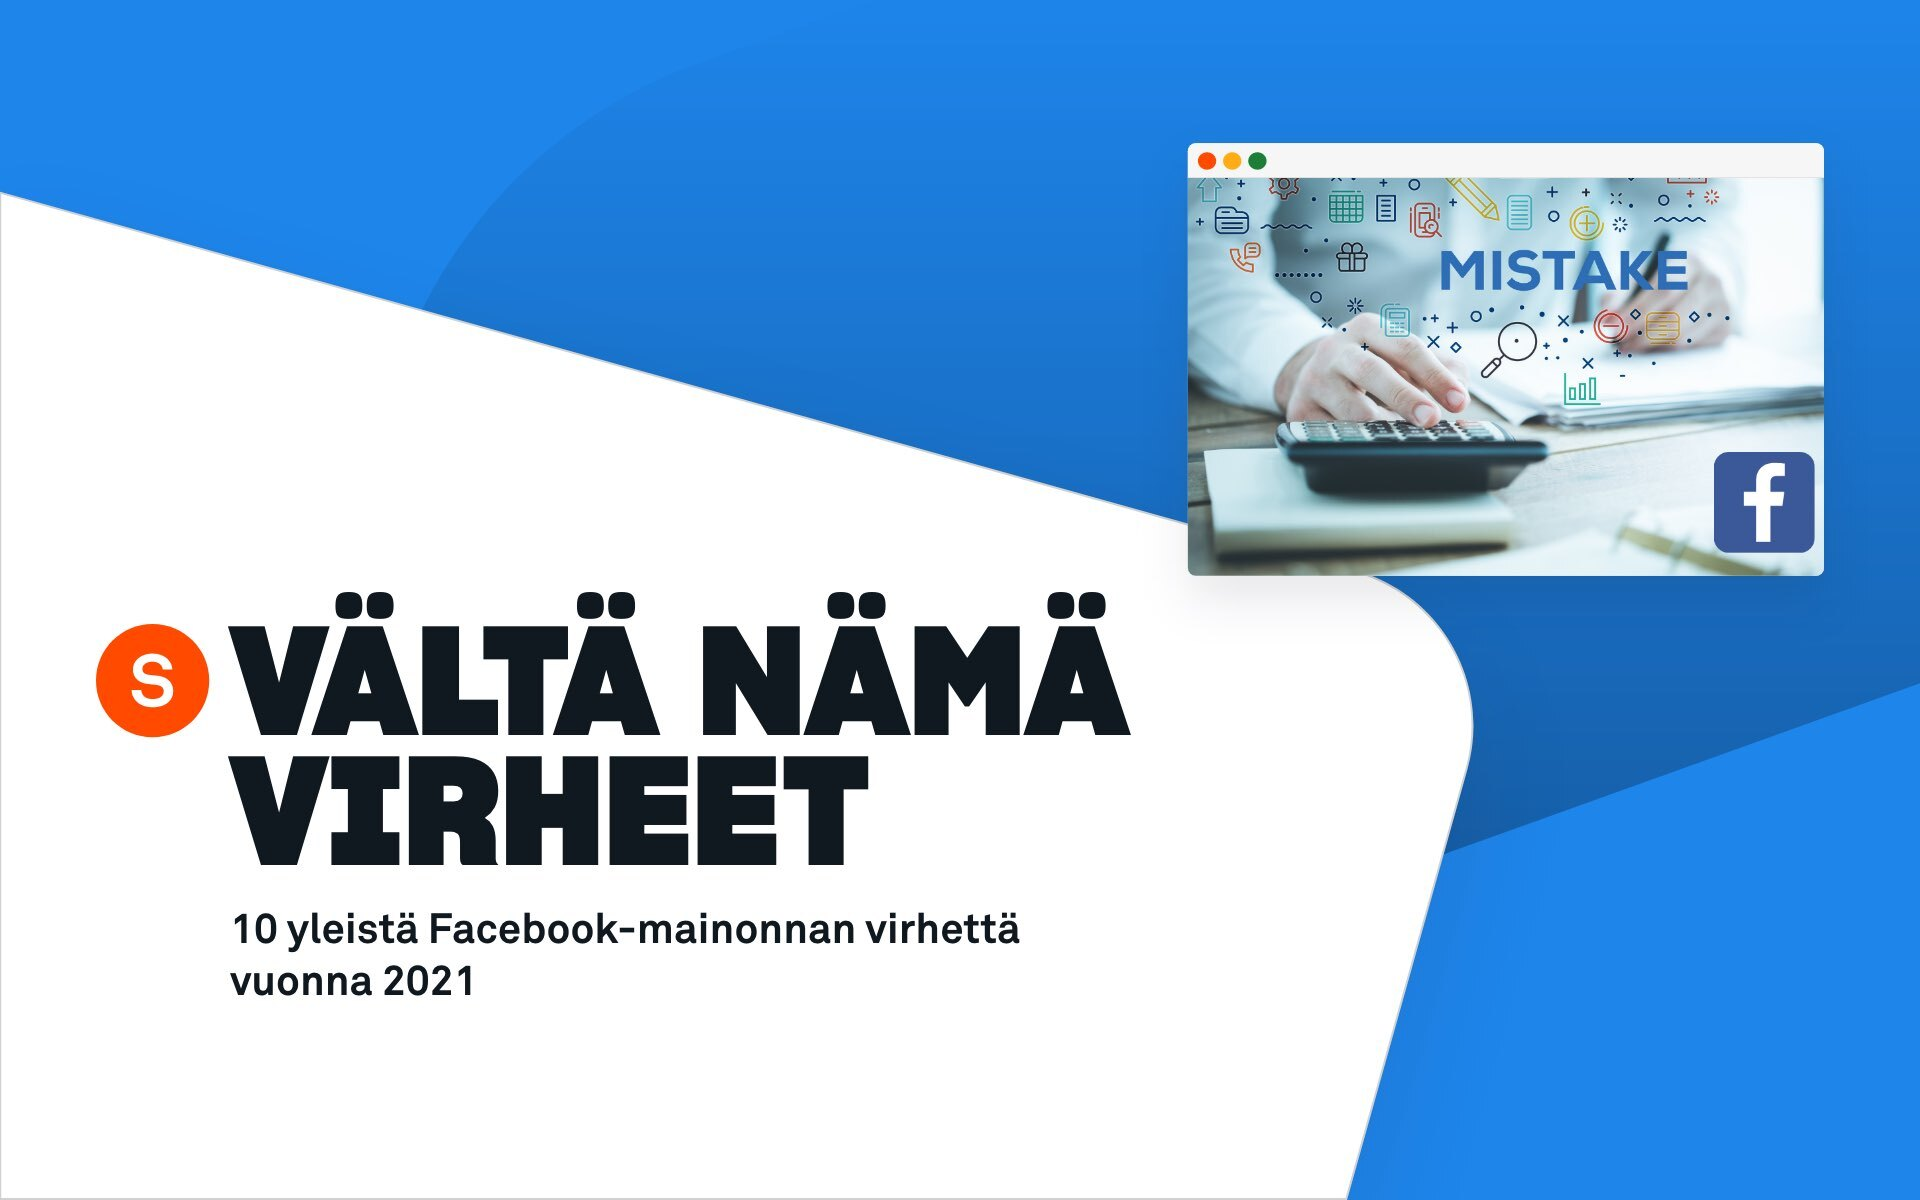 facebook-mainonnan virheet